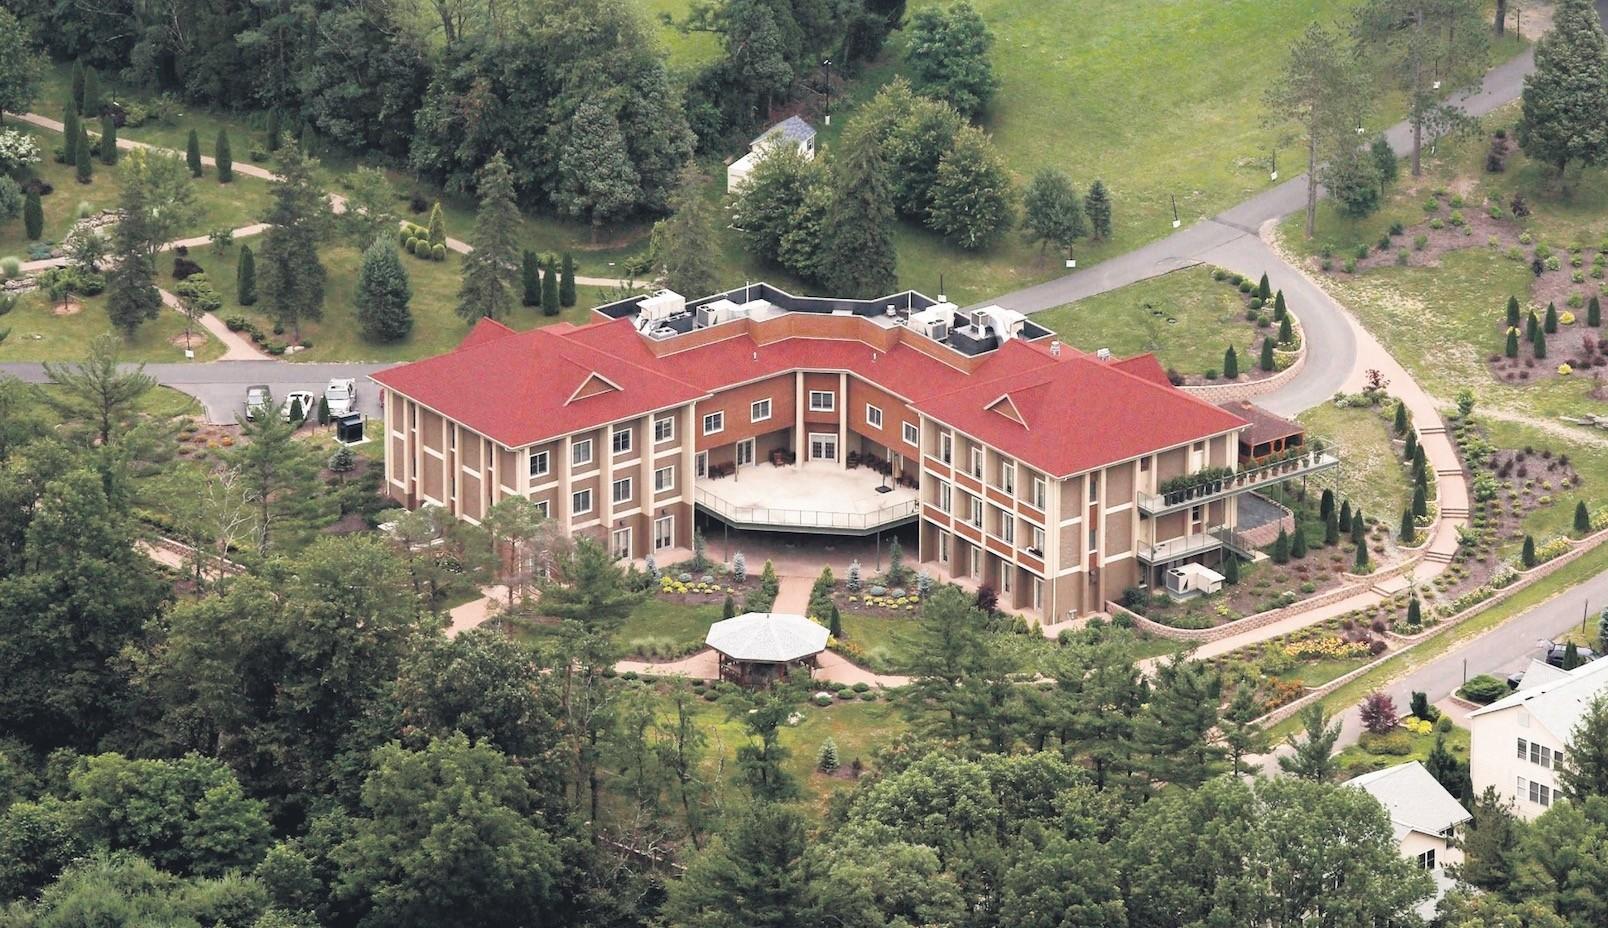 FETu00d6 cult leader Fetullah Gu00fclen's mansion in rural Saylorsburg, Pennsylvania, U.S.